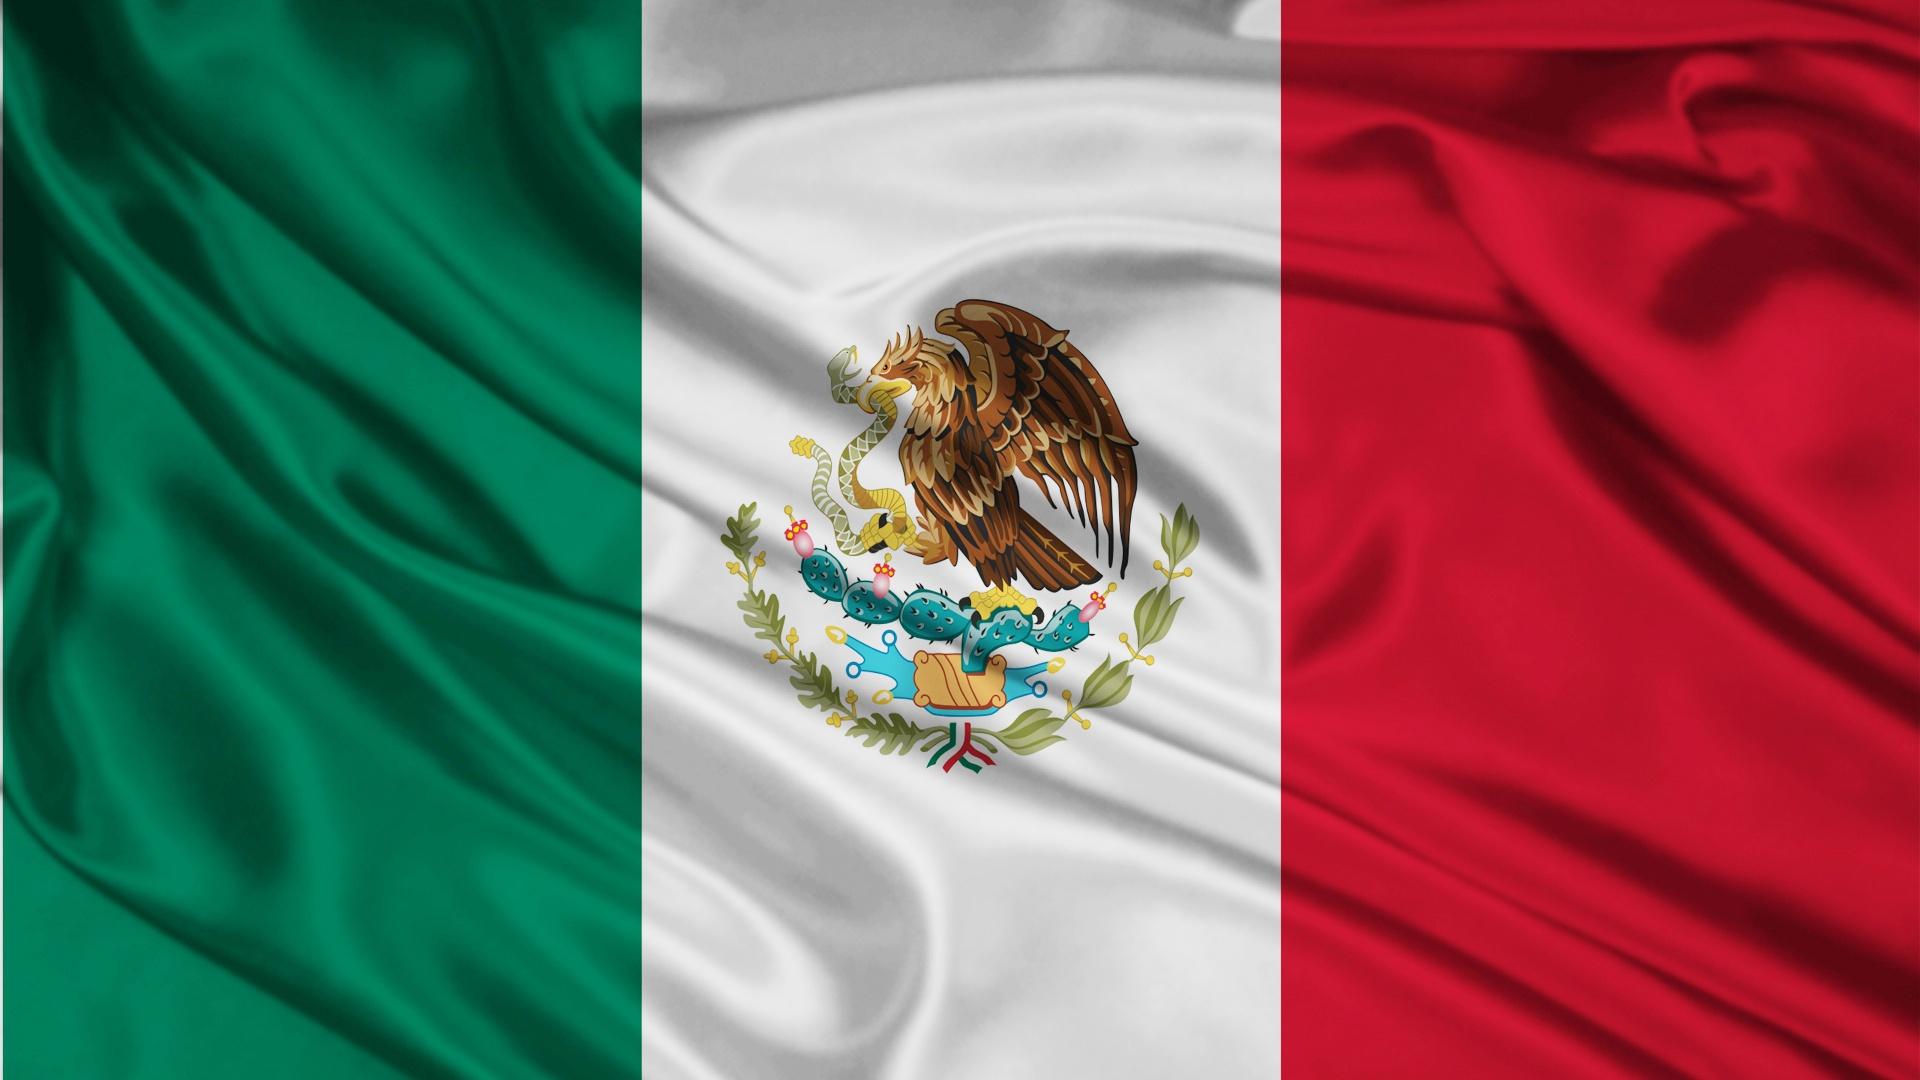 1920x1080 Mexico Flag desktop PC and Mac wallpaper 1920x1080